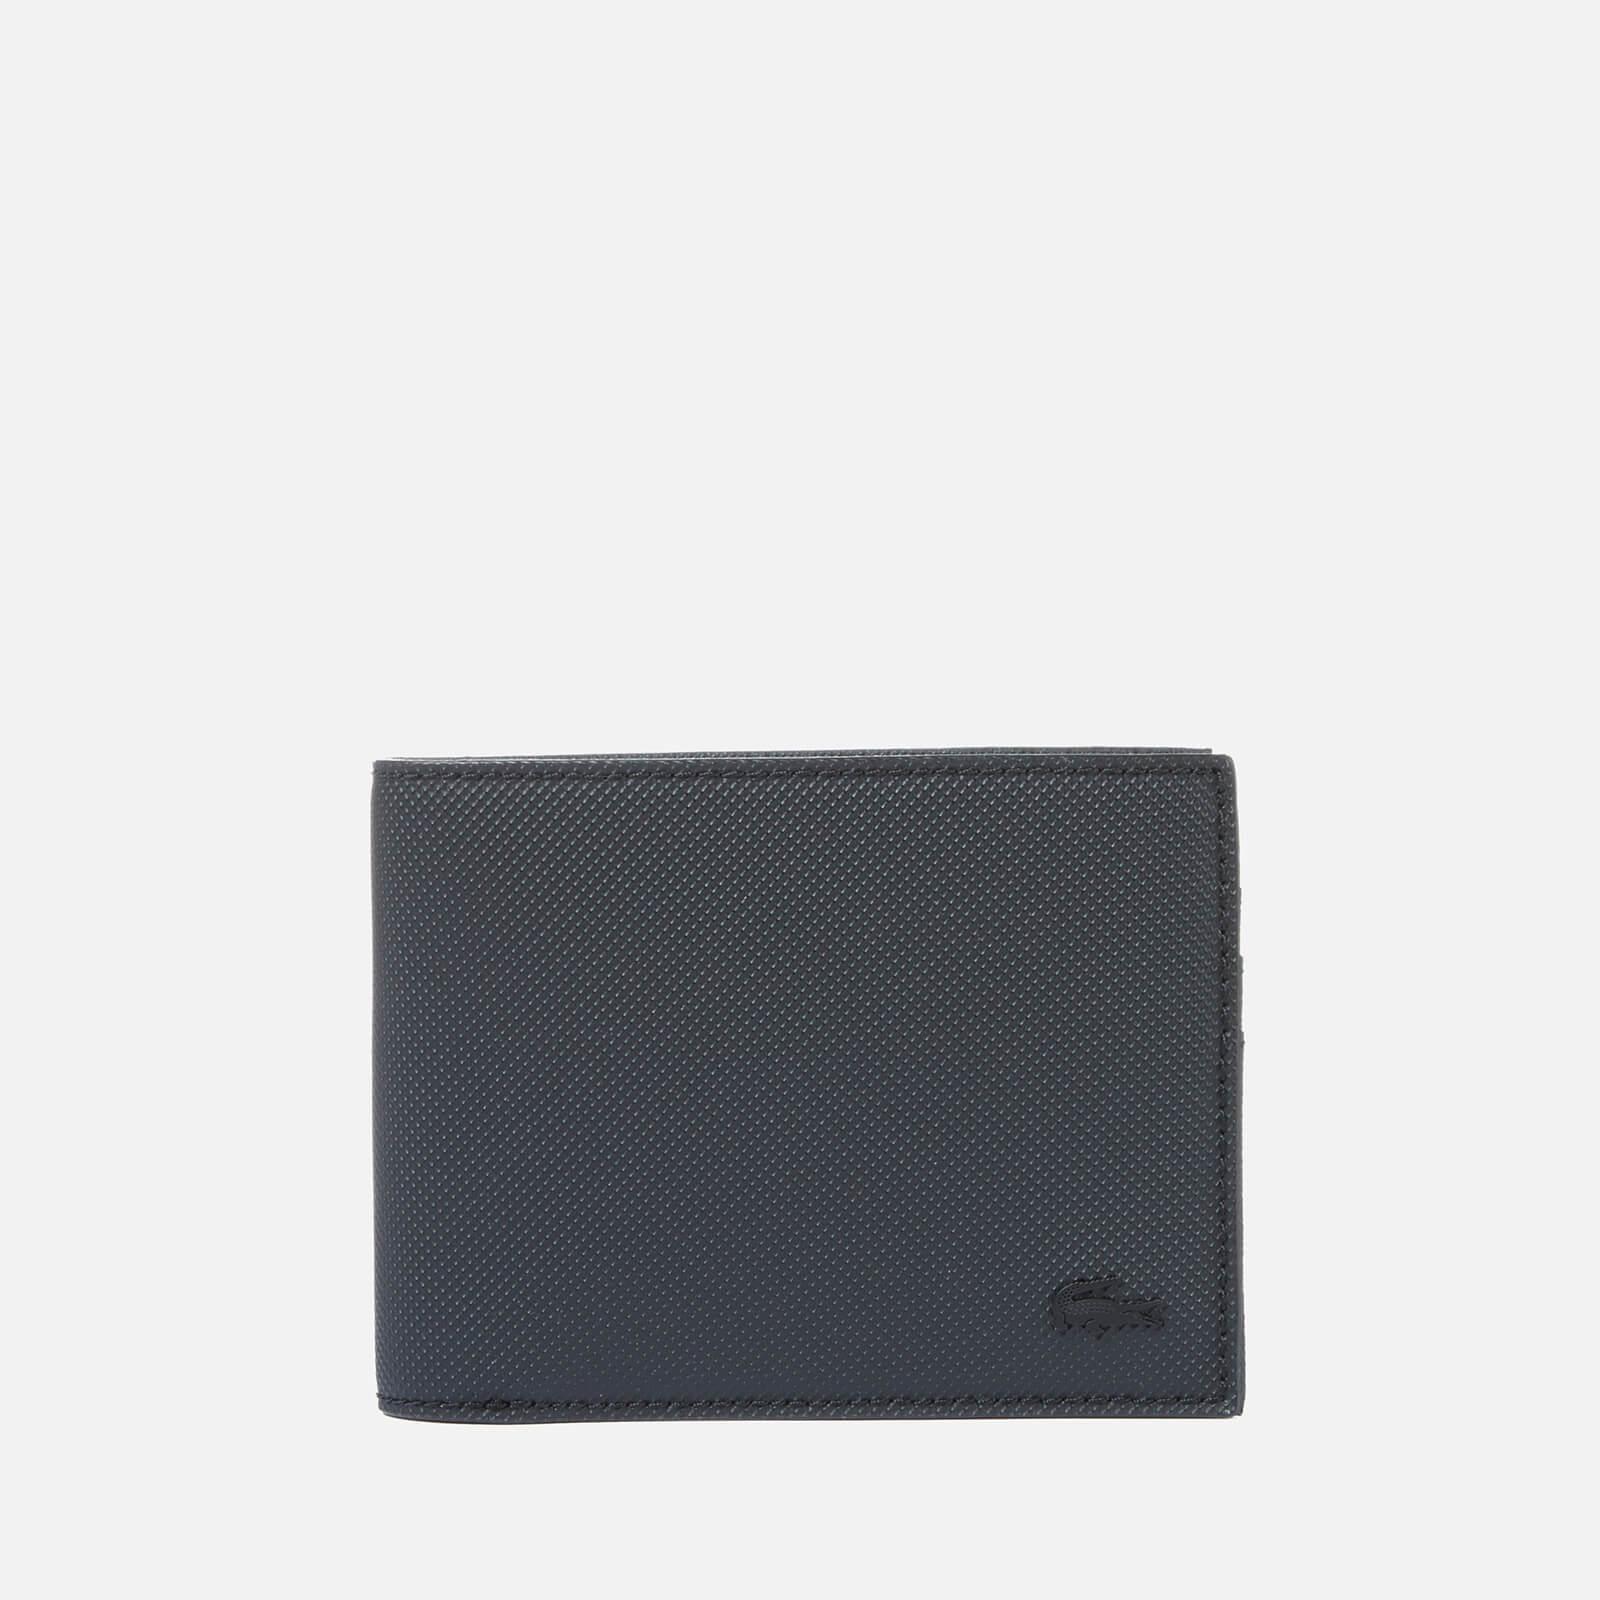 a7d604ca2f55 Lacoste Men s Billfold Wallet - Black - Free UK Delivery over £50